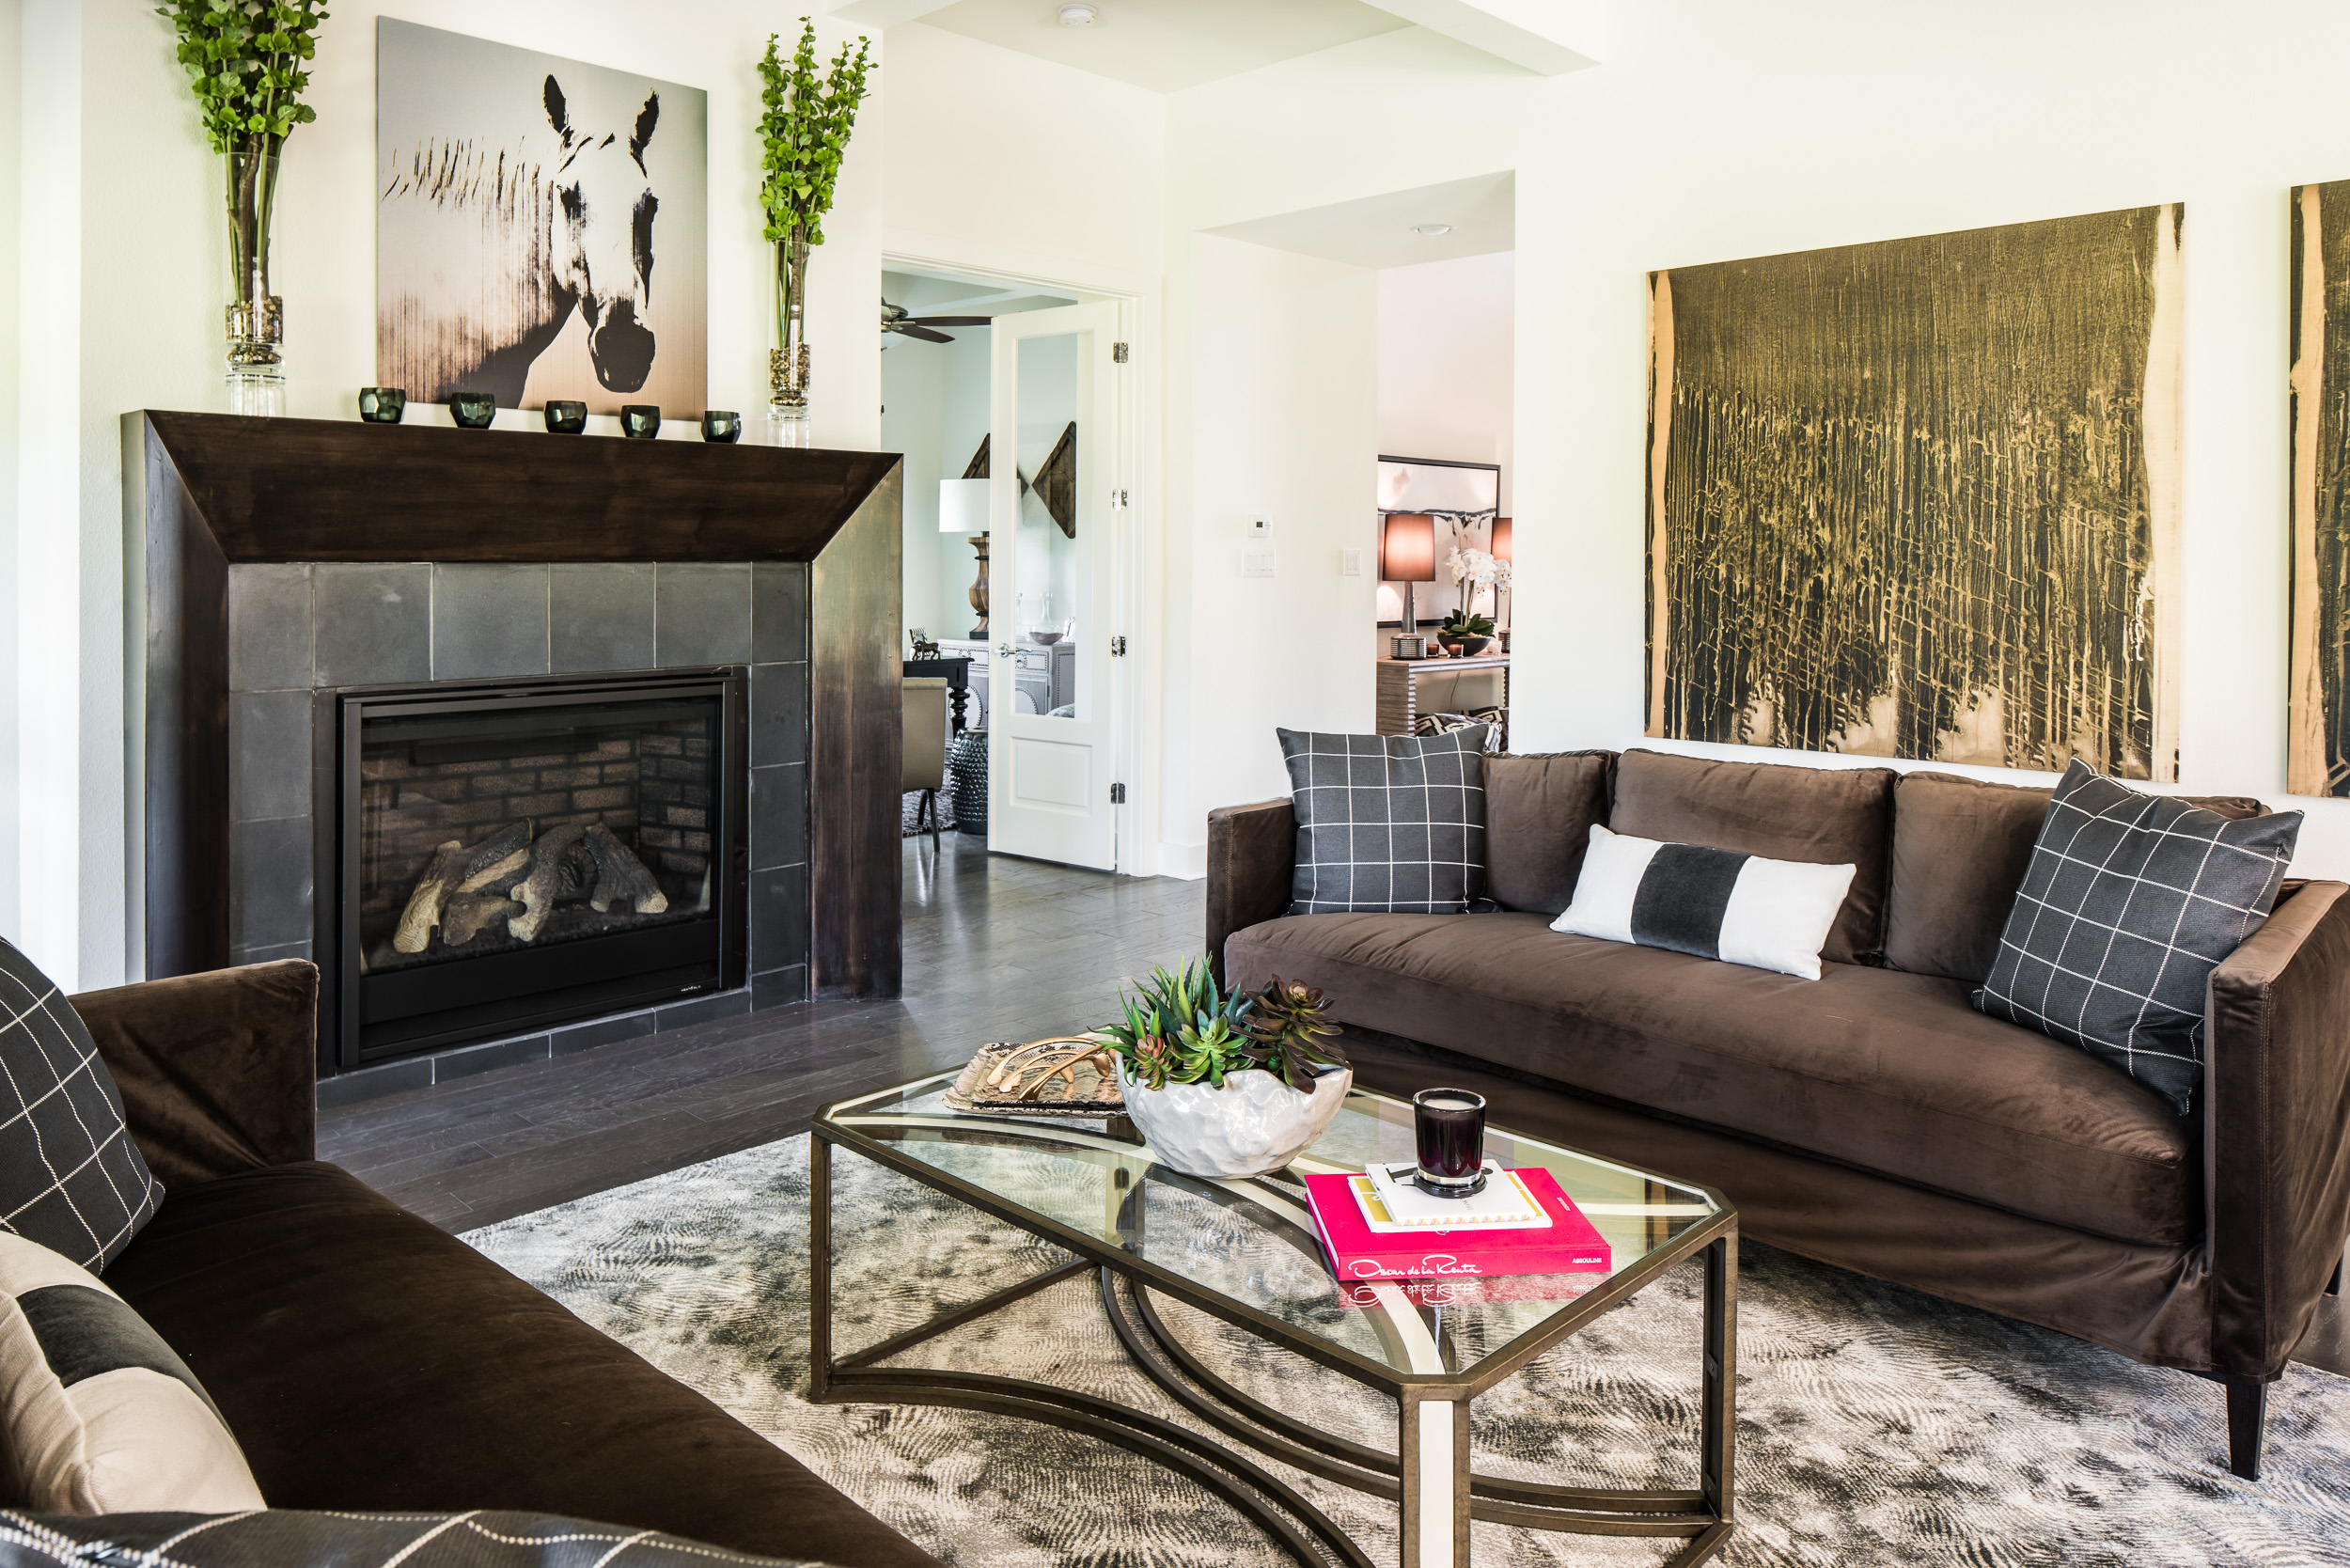 lori-caldwell-designs-interior-002.jpg